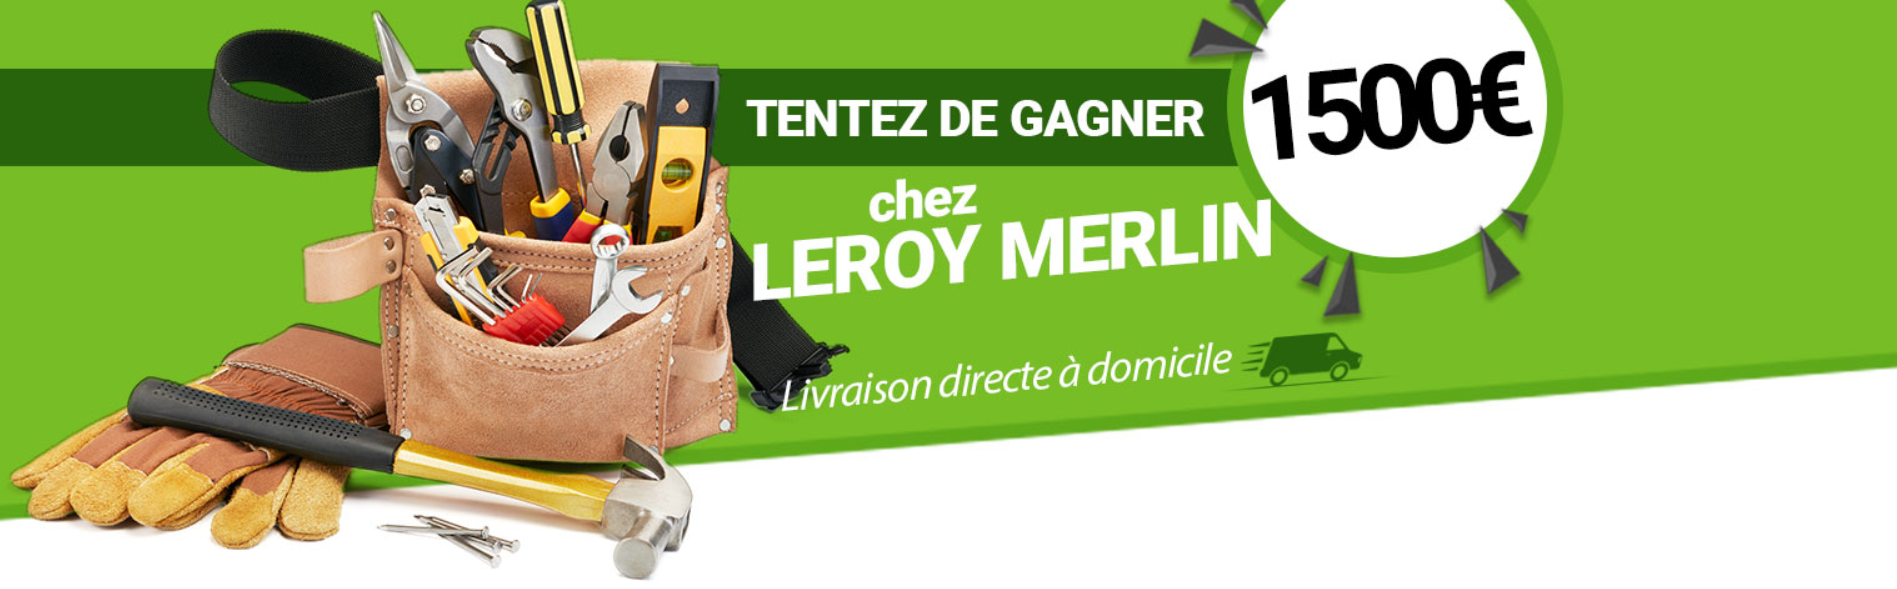 leroy merlin concours